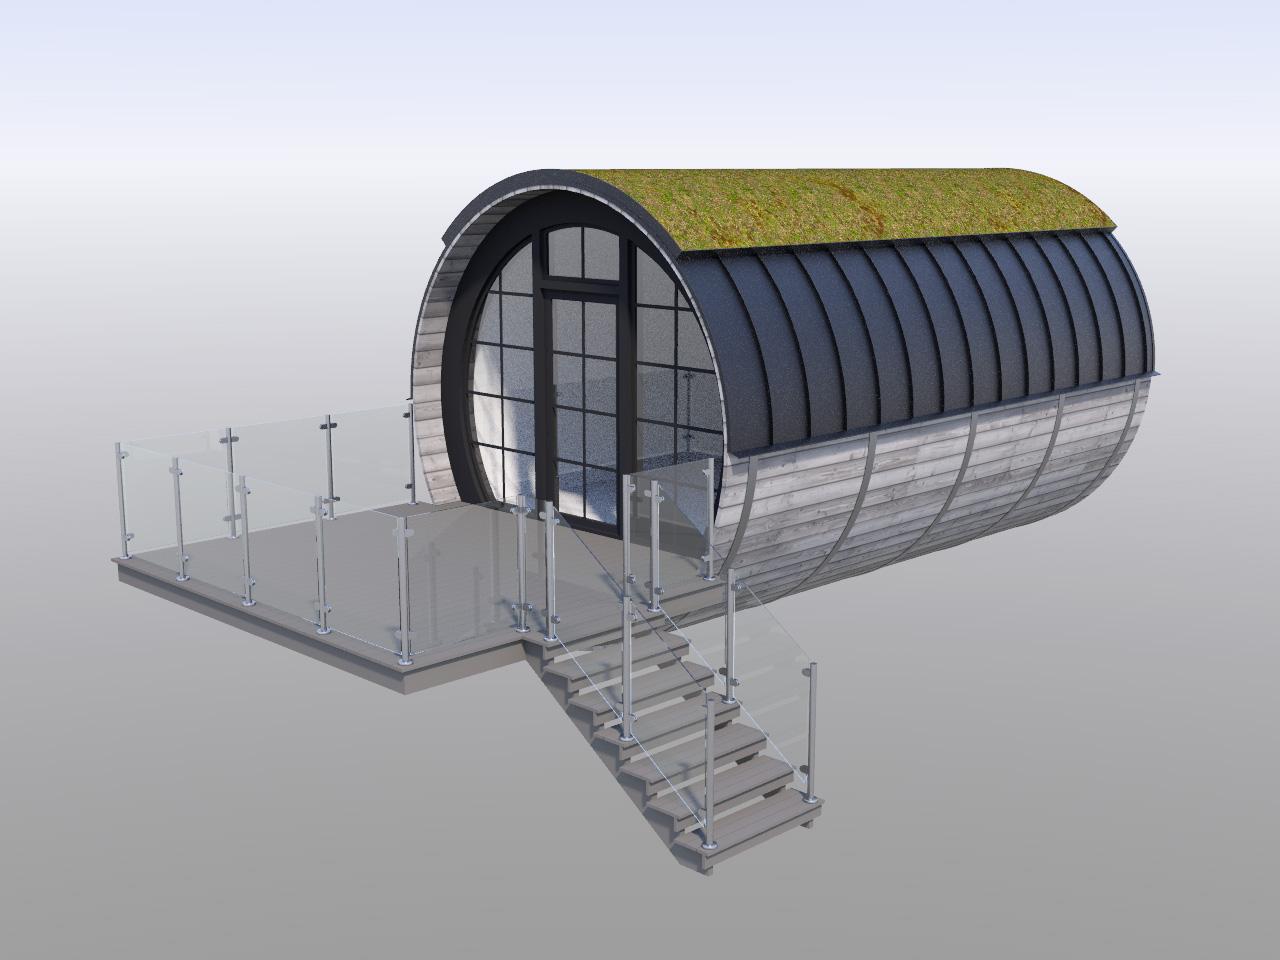 arkitektur-3d-visualisering_laj-illustration